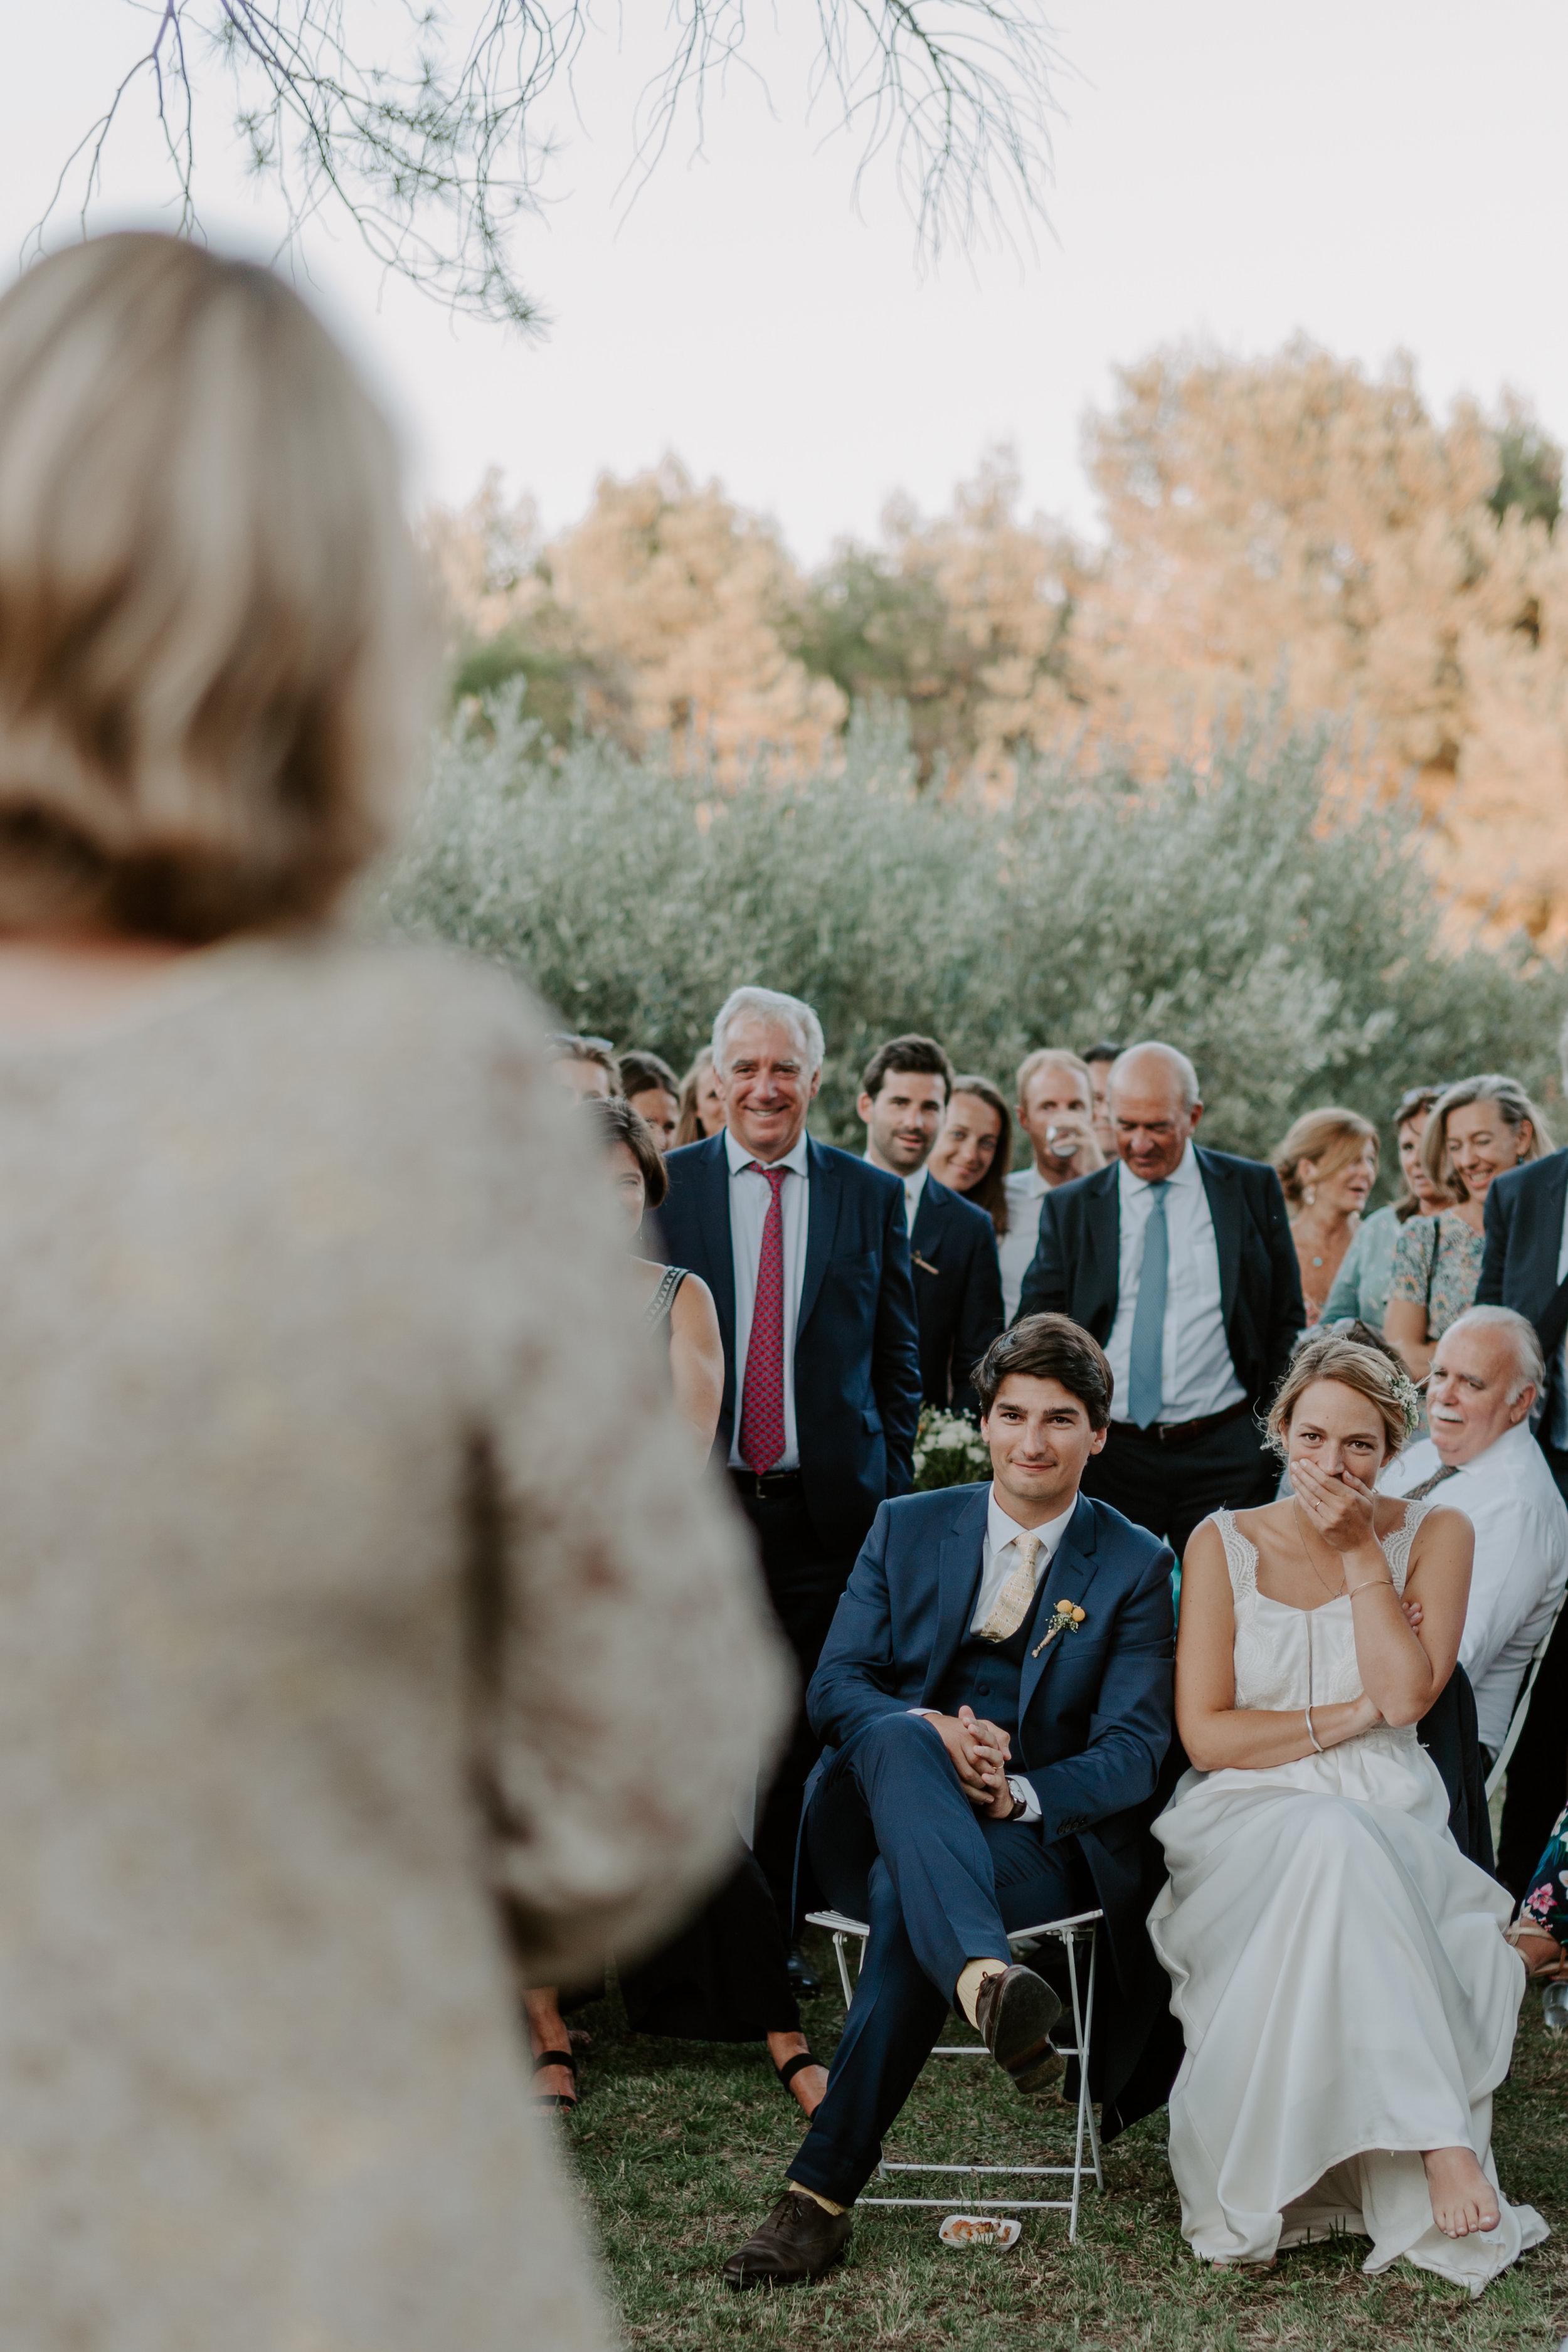 elsacaza_photographe_mariage_Juliette_Nicolas-603.jpg